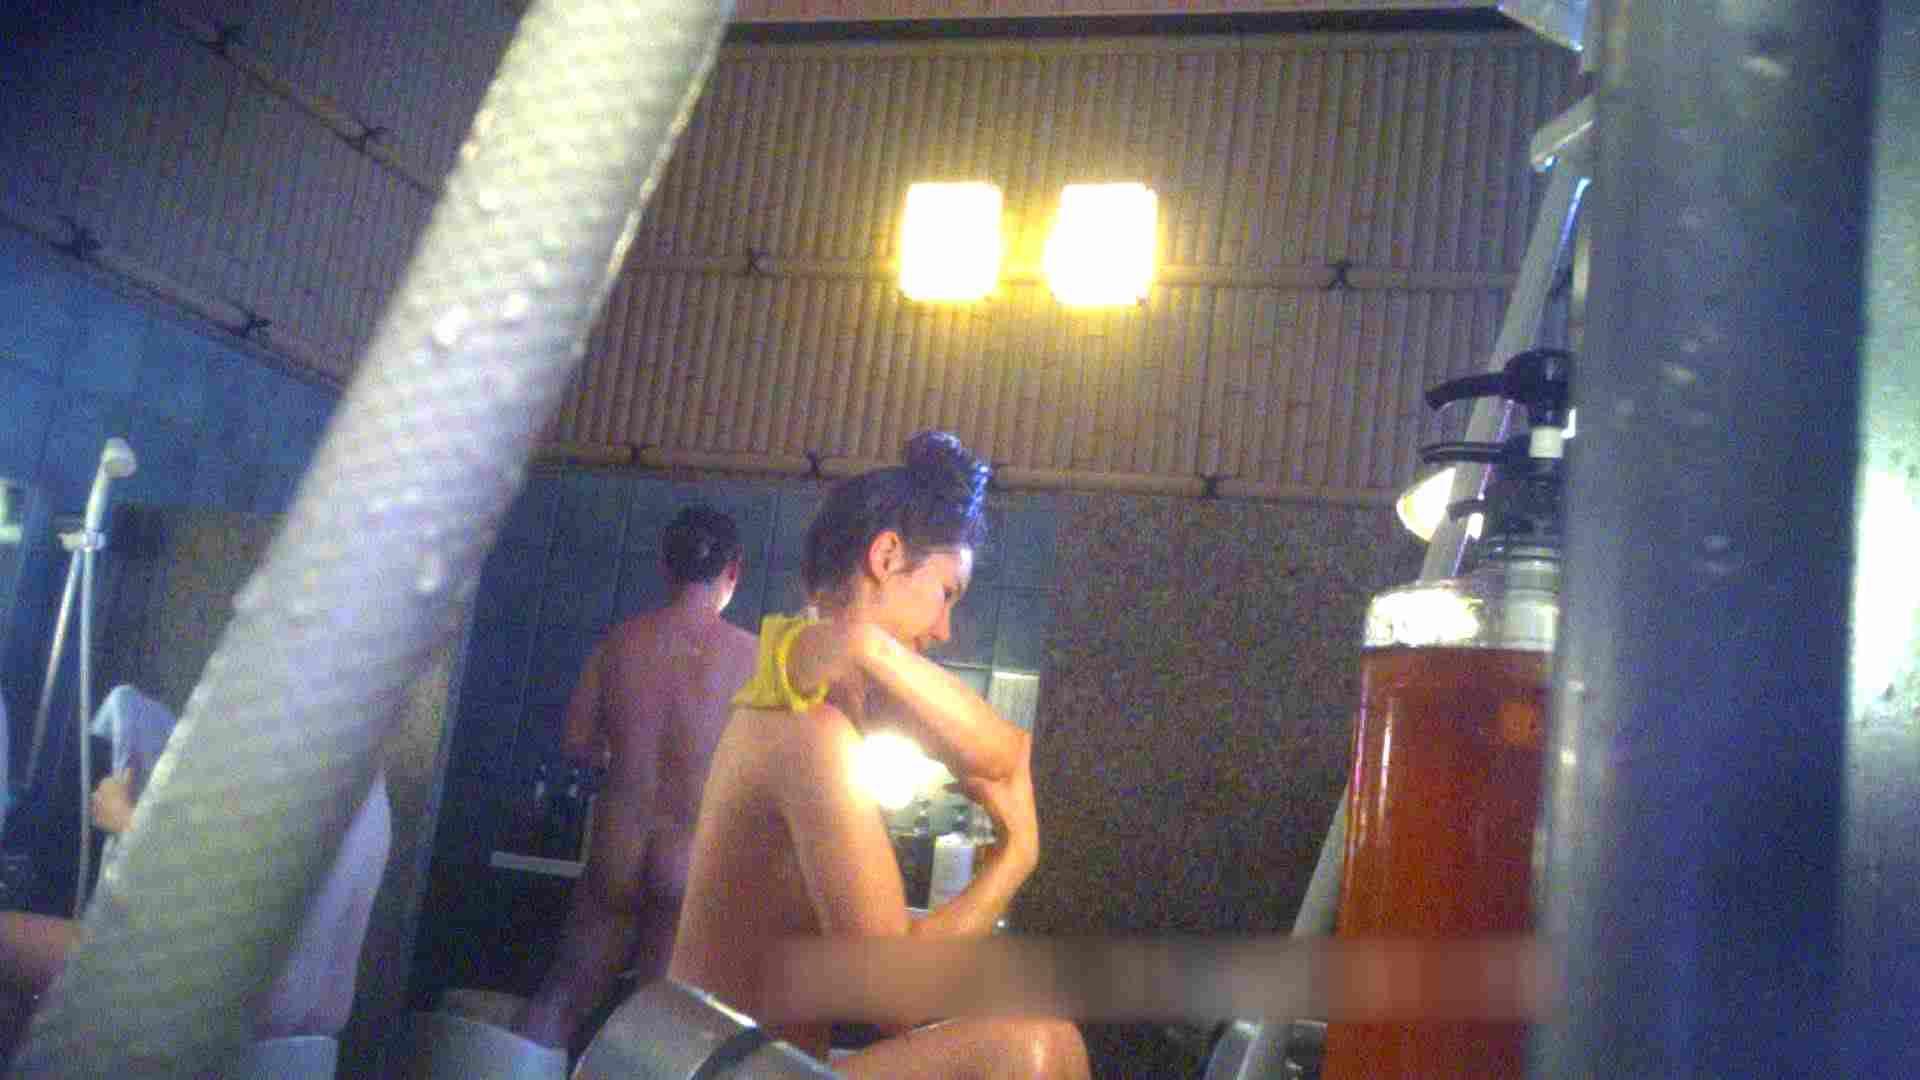 TG.15 【上等兵】高級旅館の爆乳女将で有名っぽい アラ40 セックス画像 110枚 75